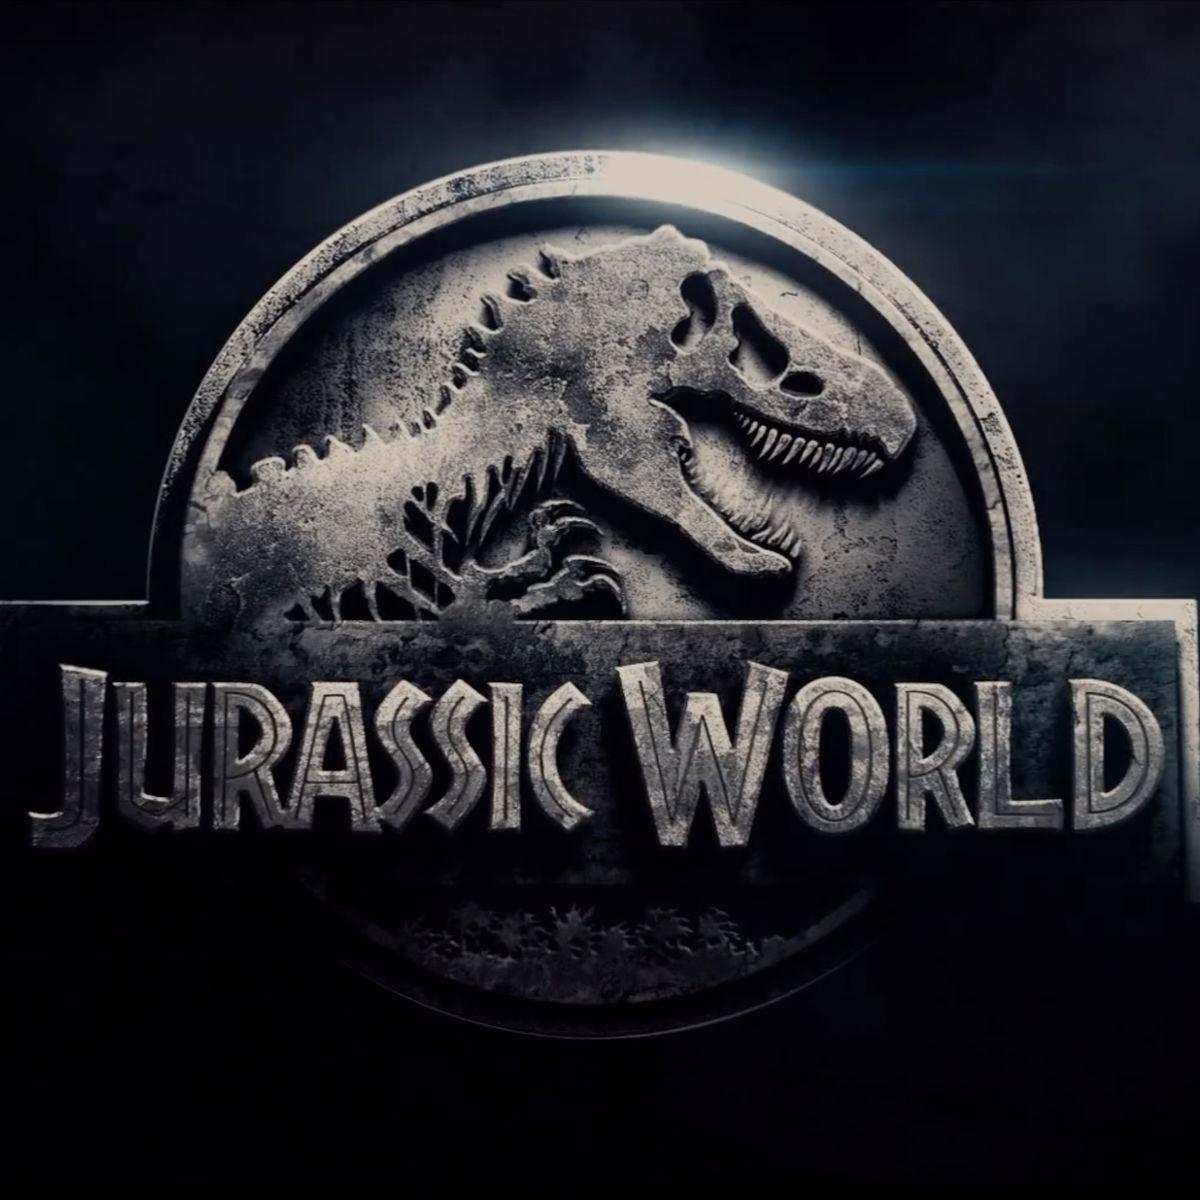 Jurassic-World-logo.jpg